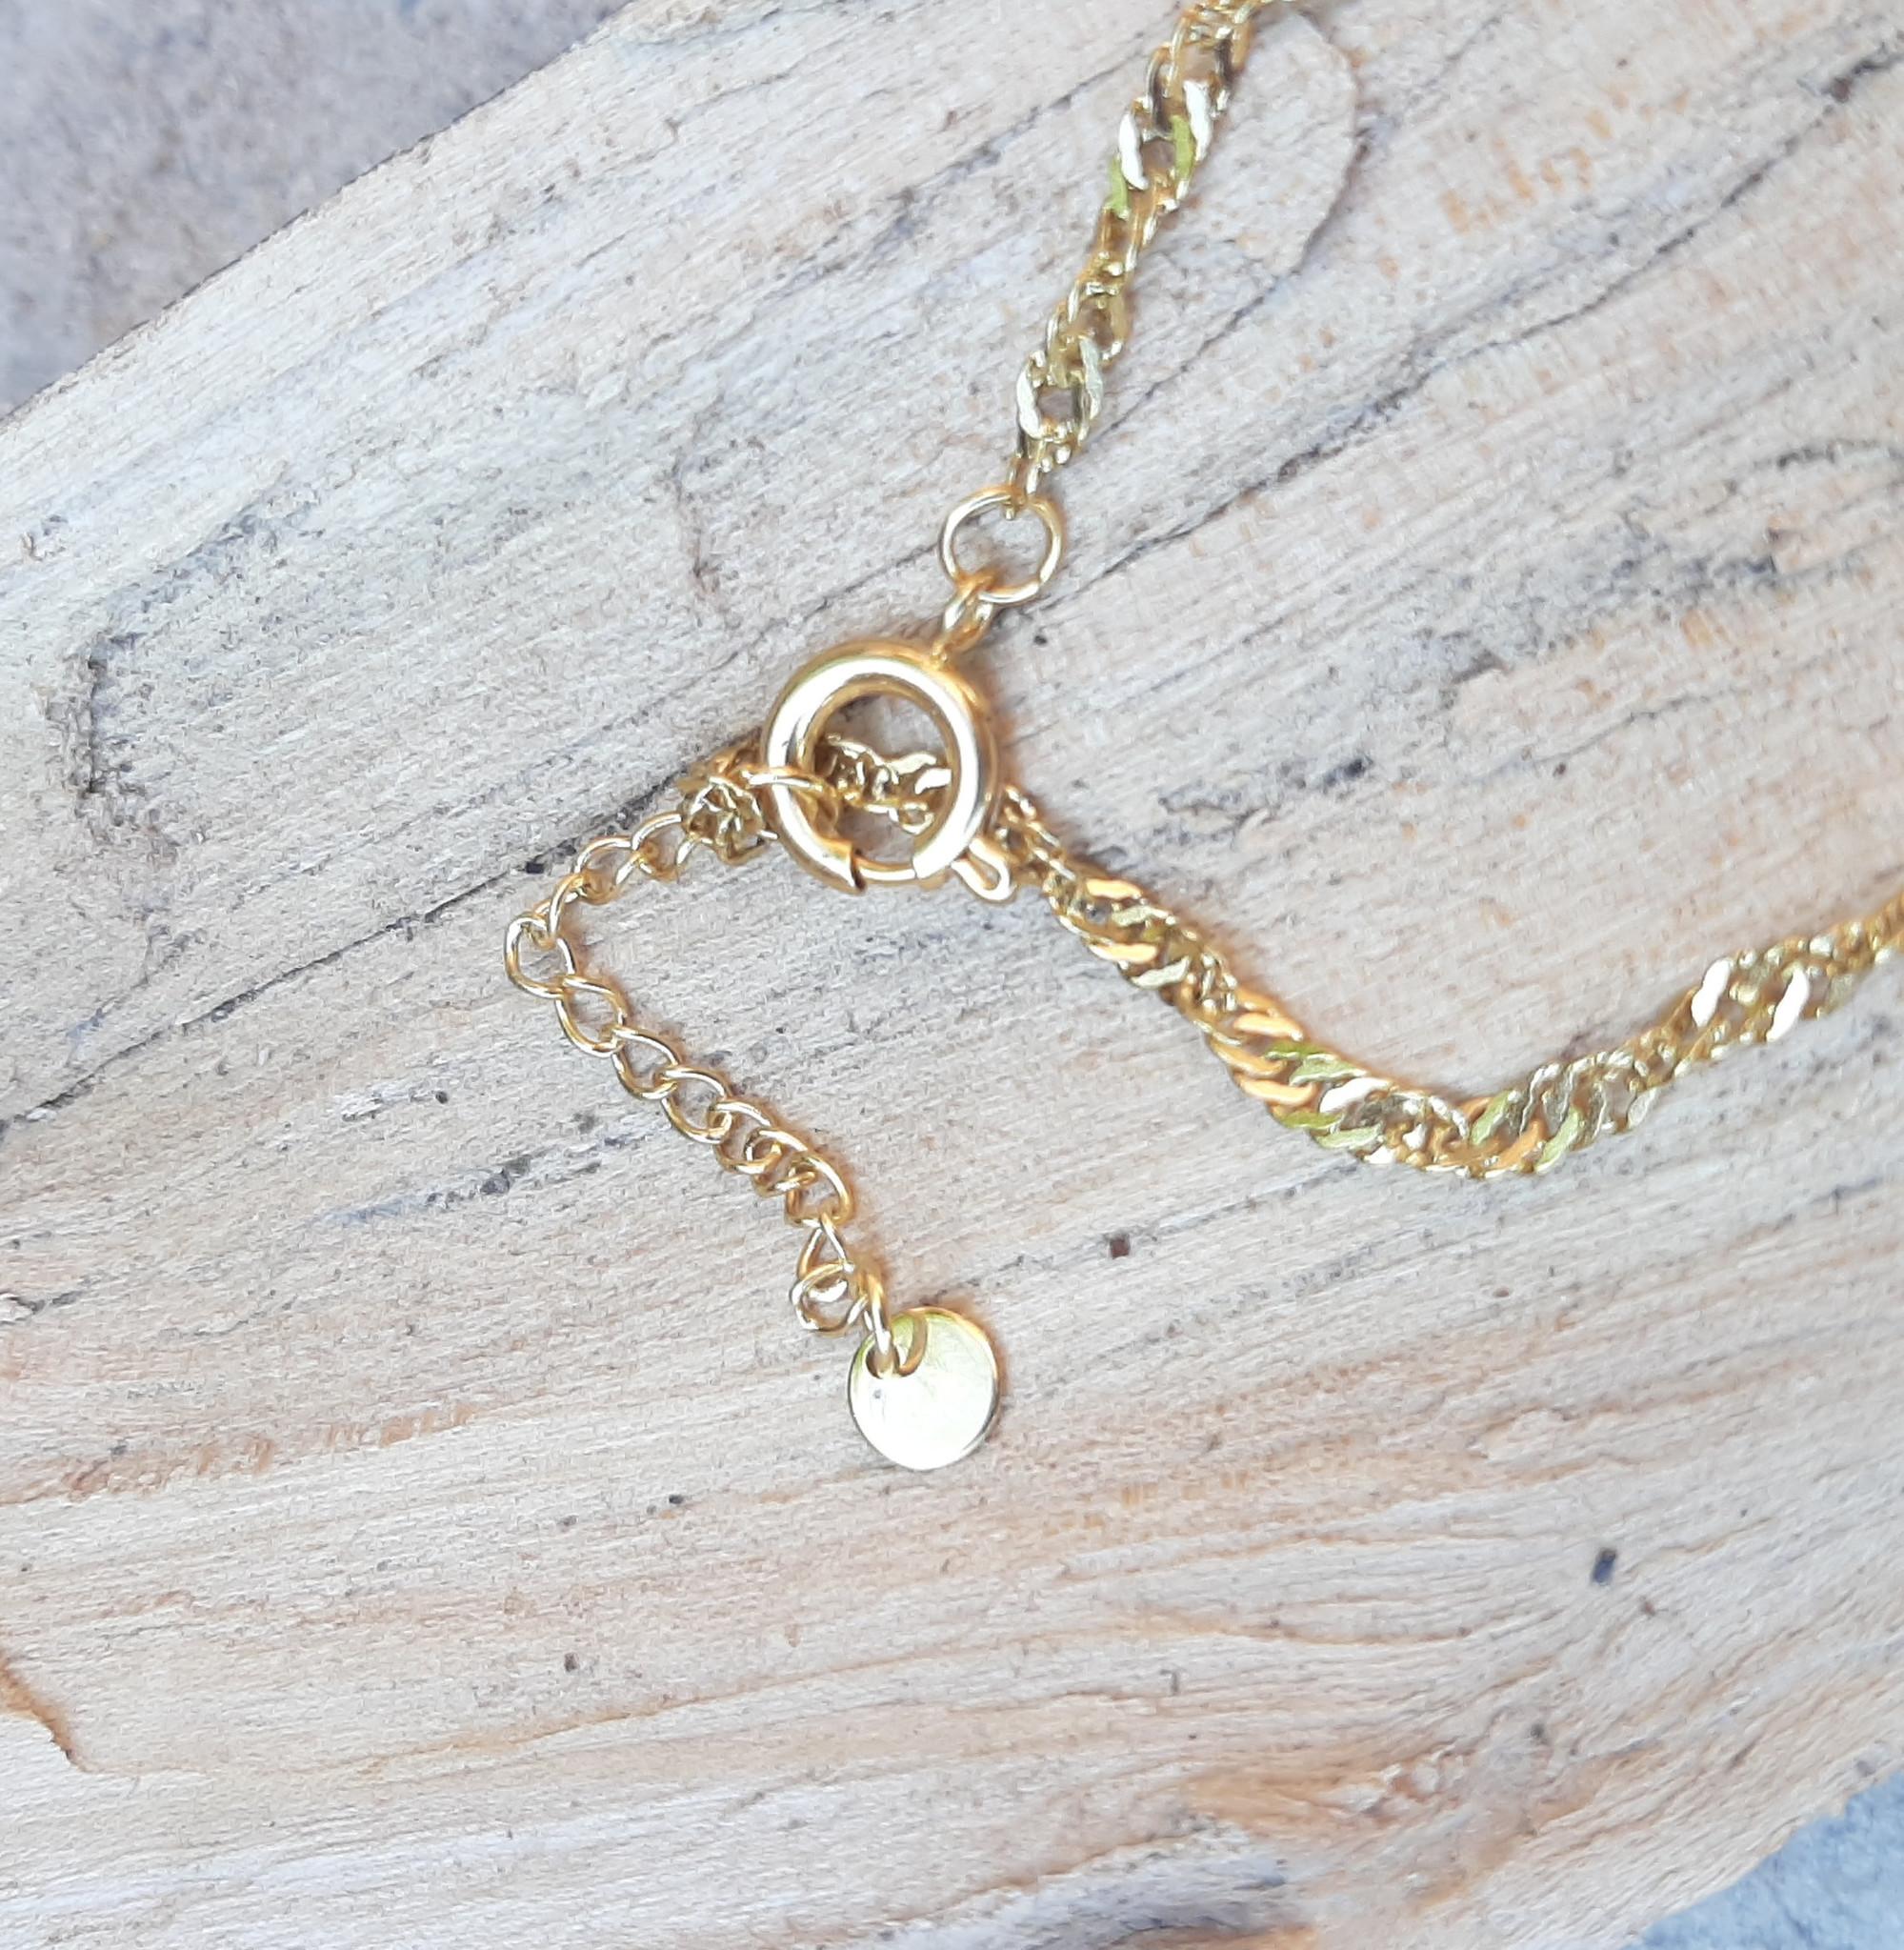 Sazou Jewels Enkelbandje Stainless Steel Gold Plated Wave Jasseron met schelp